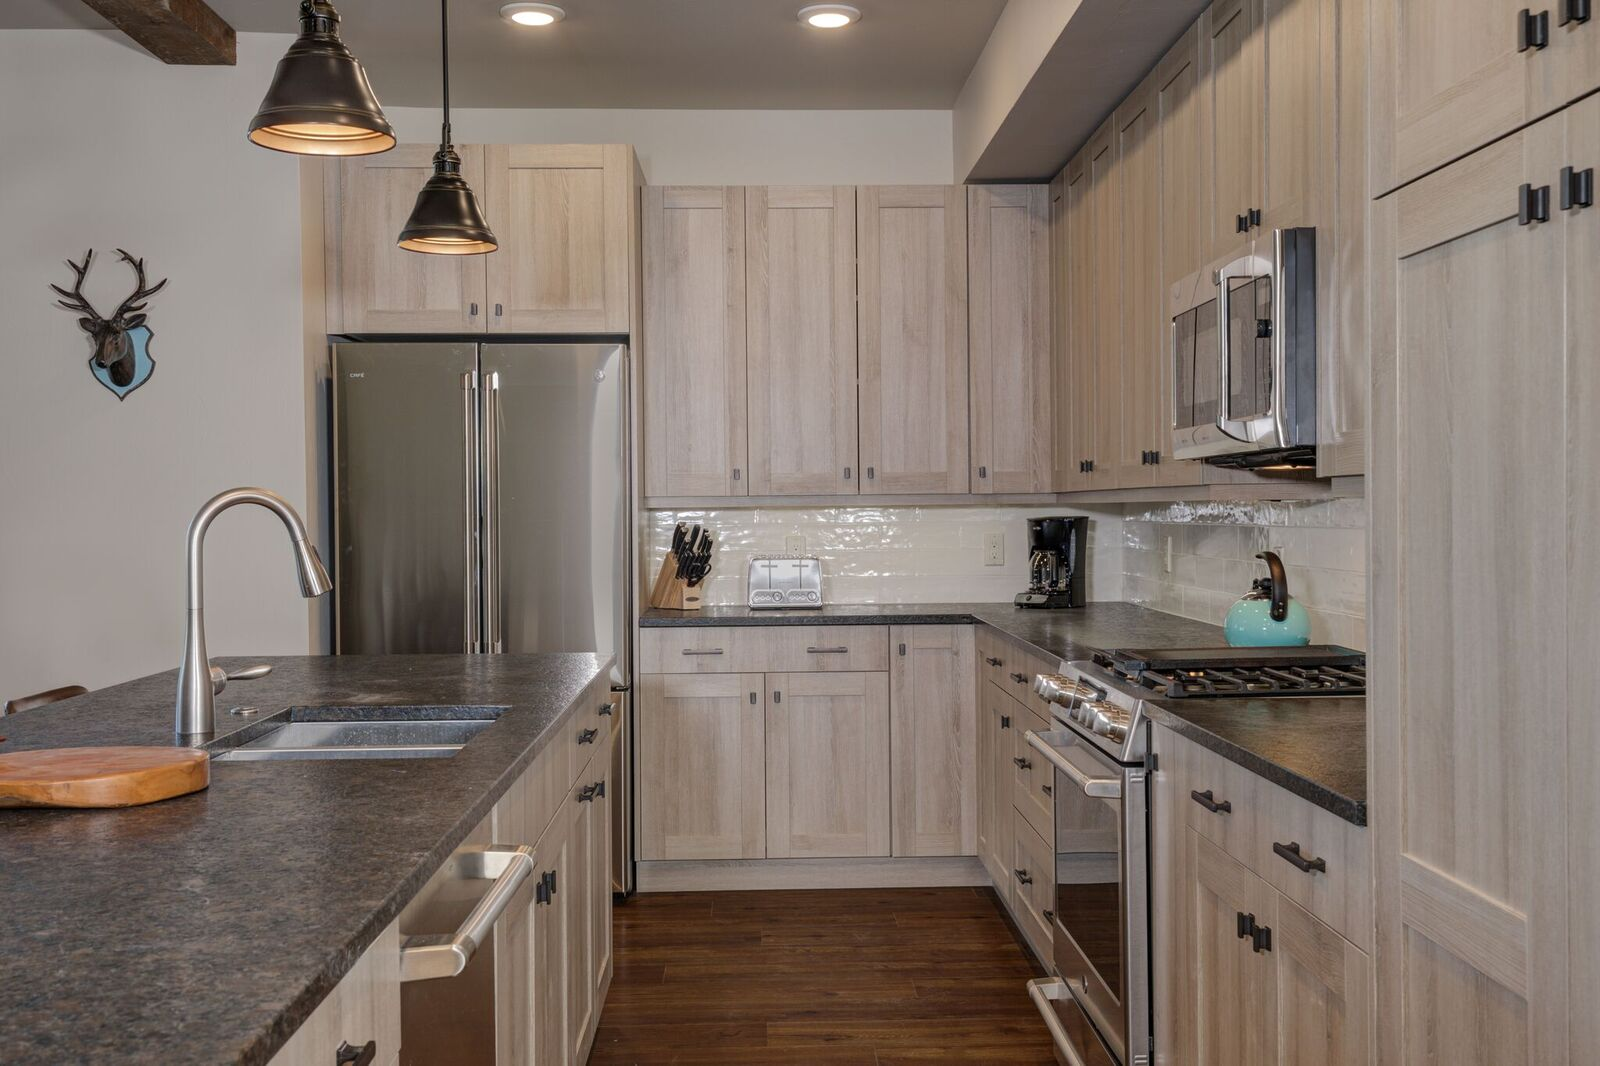 301 Kitchen.jpeg